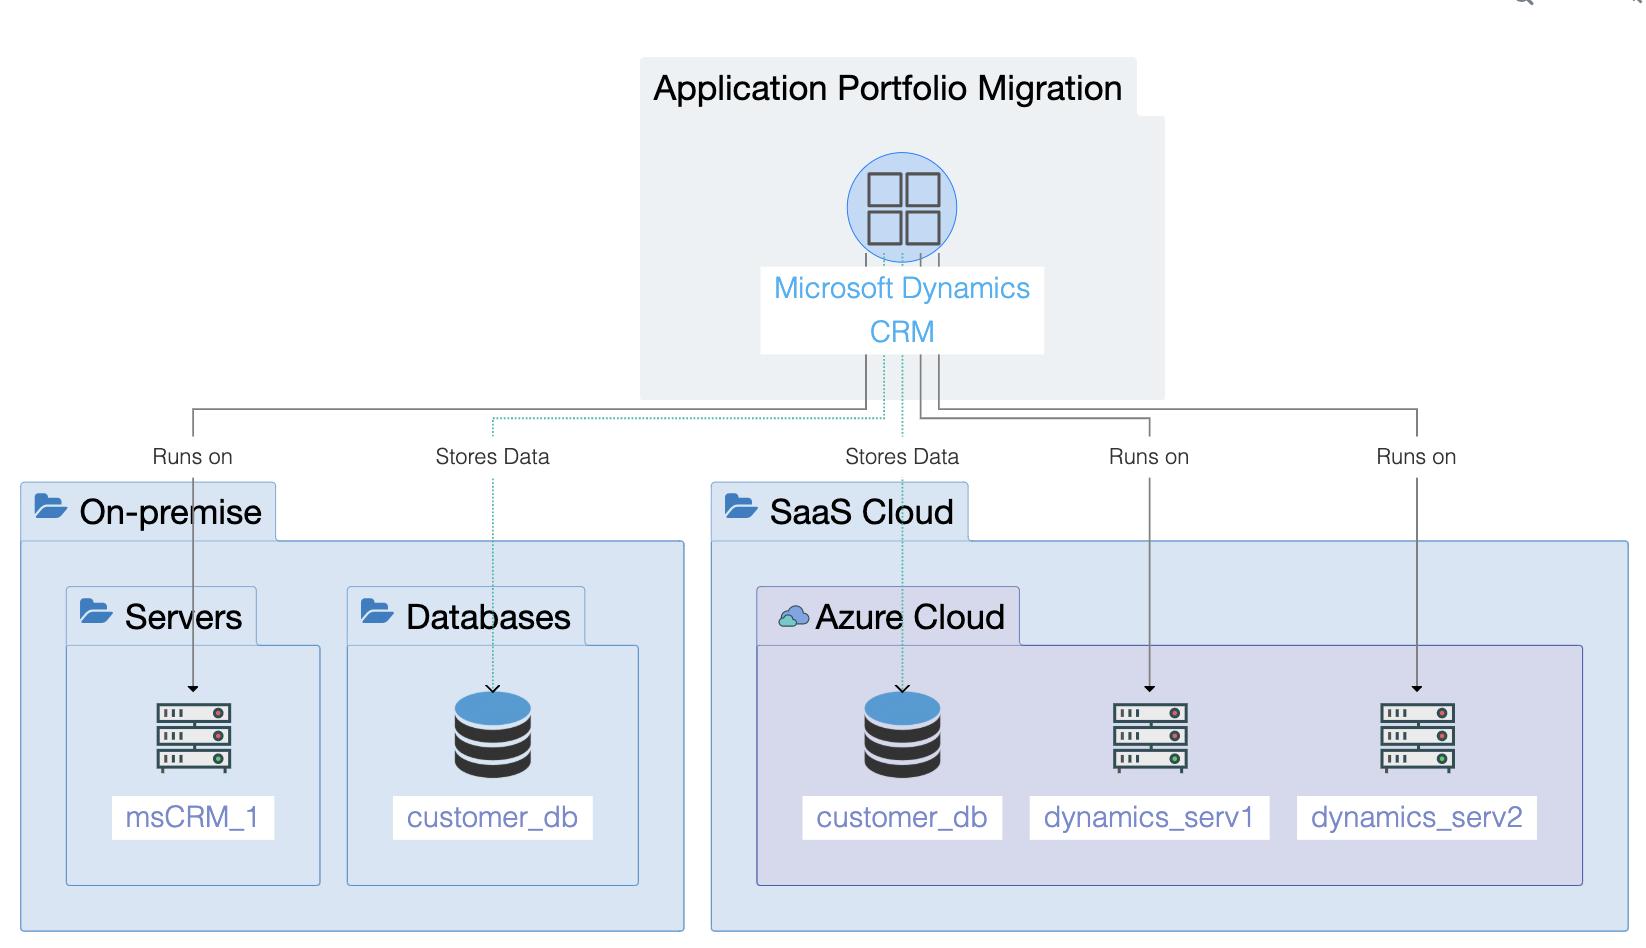 Ardoq application portfolio migration example